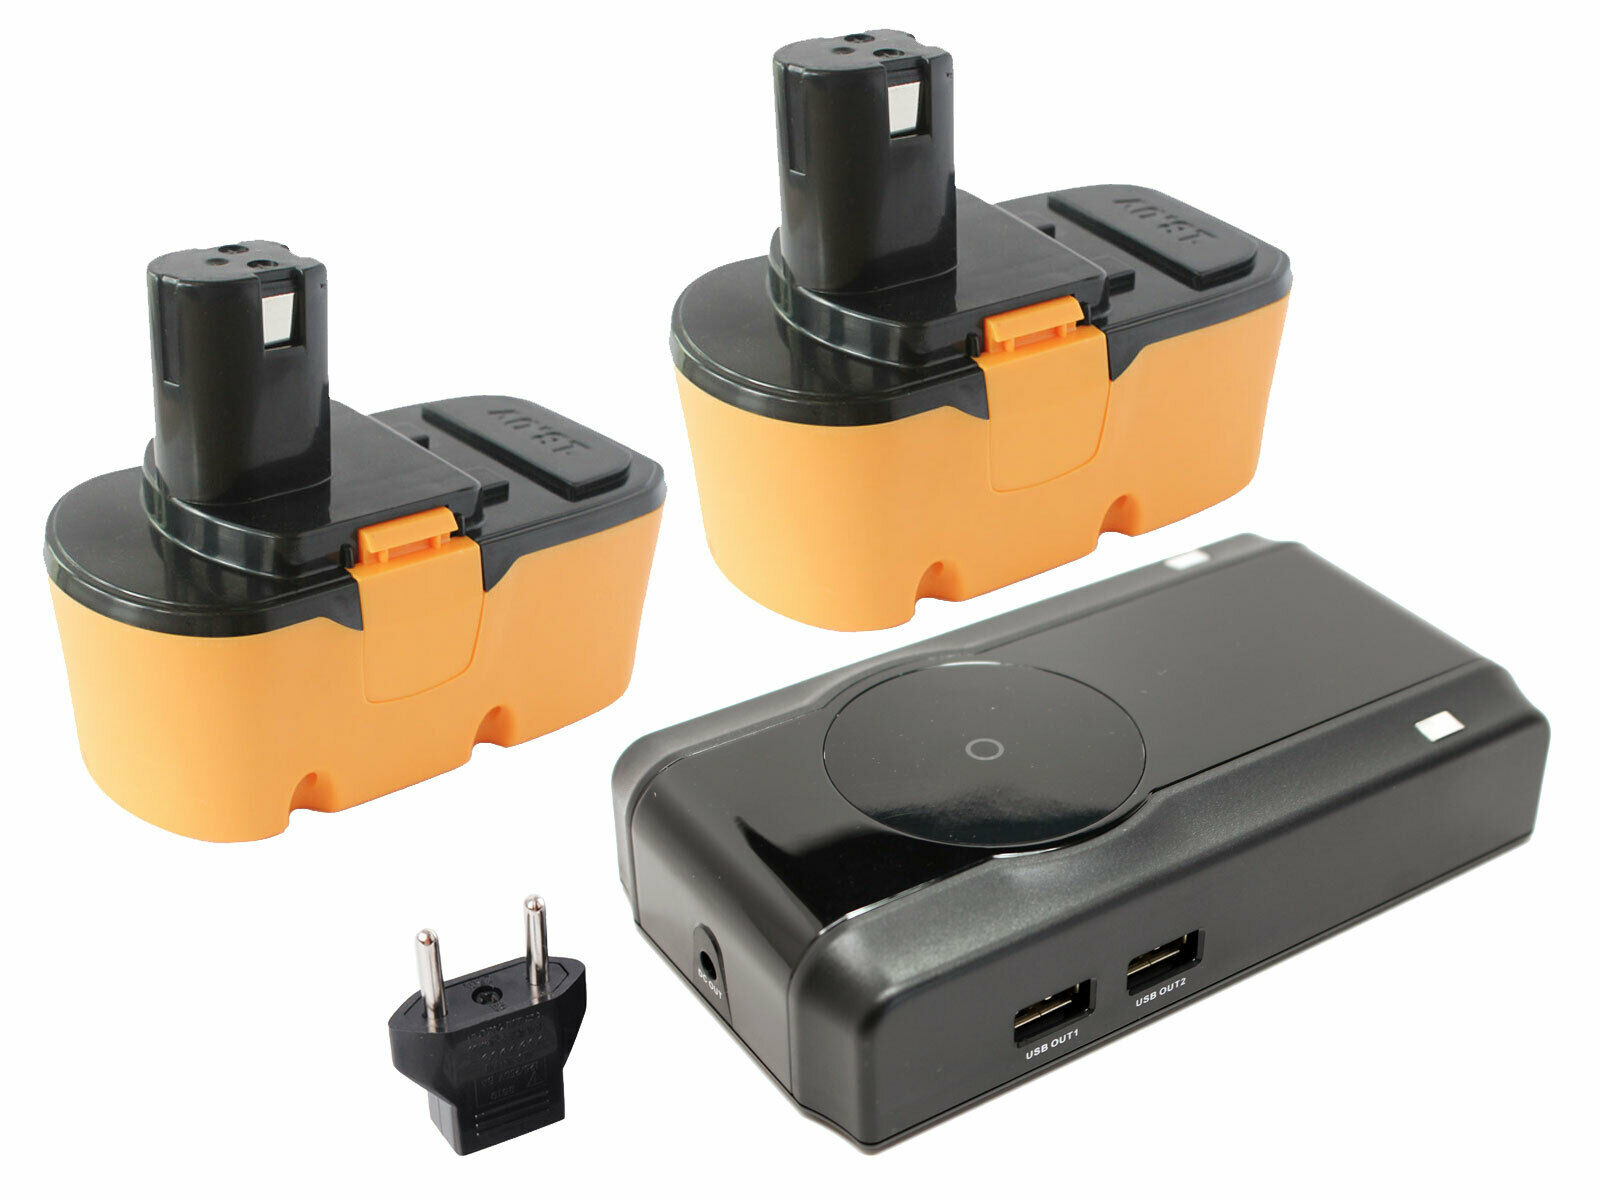 2x Ryobi 18V NICD Battery+Charger w  EU Adapterfor Ryobi p100, p700, p400, p500